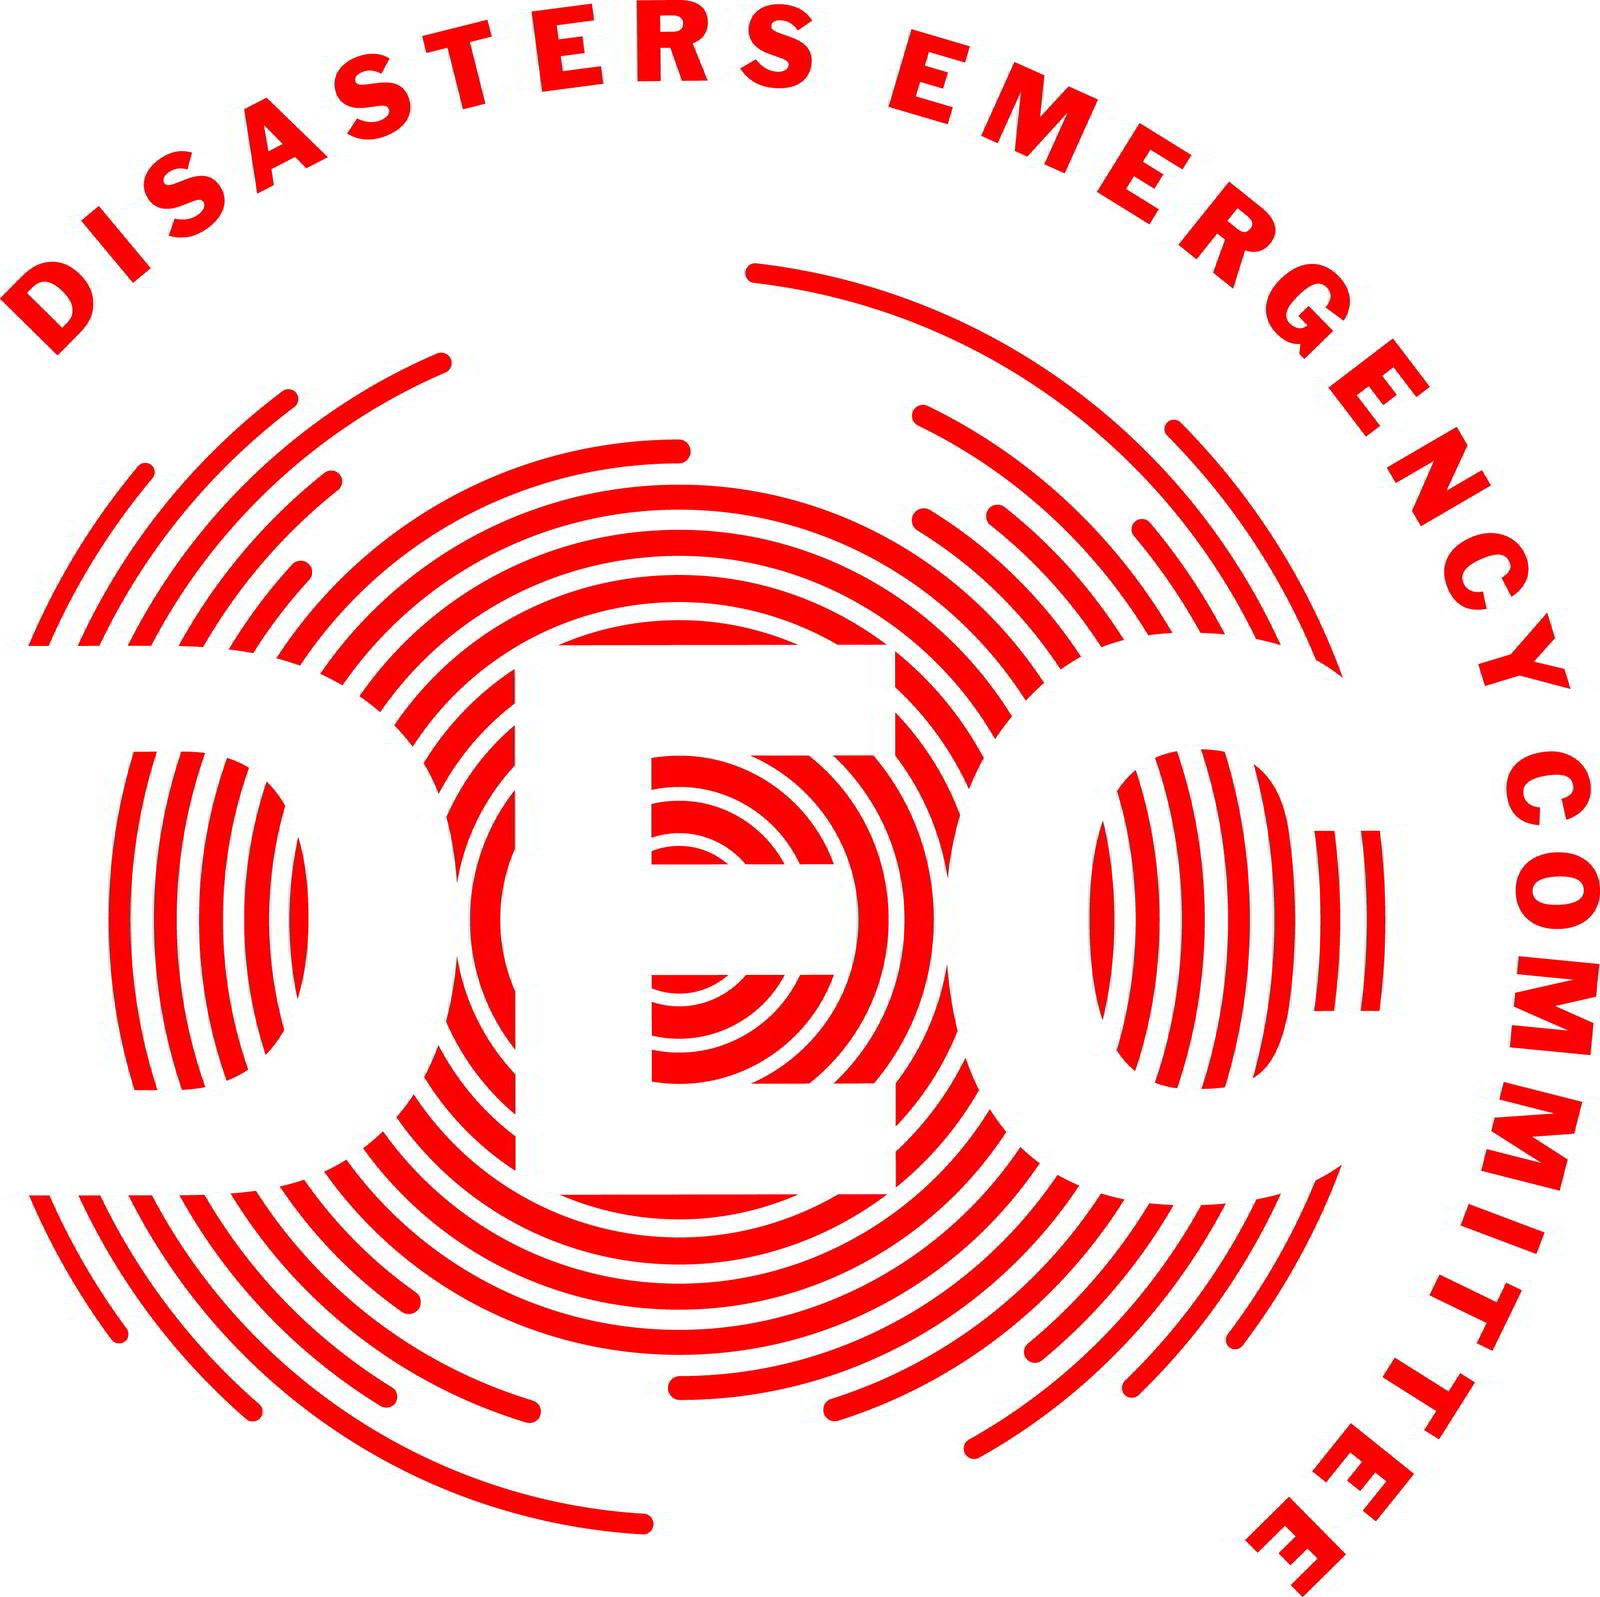 The Disasters Emergency Committee